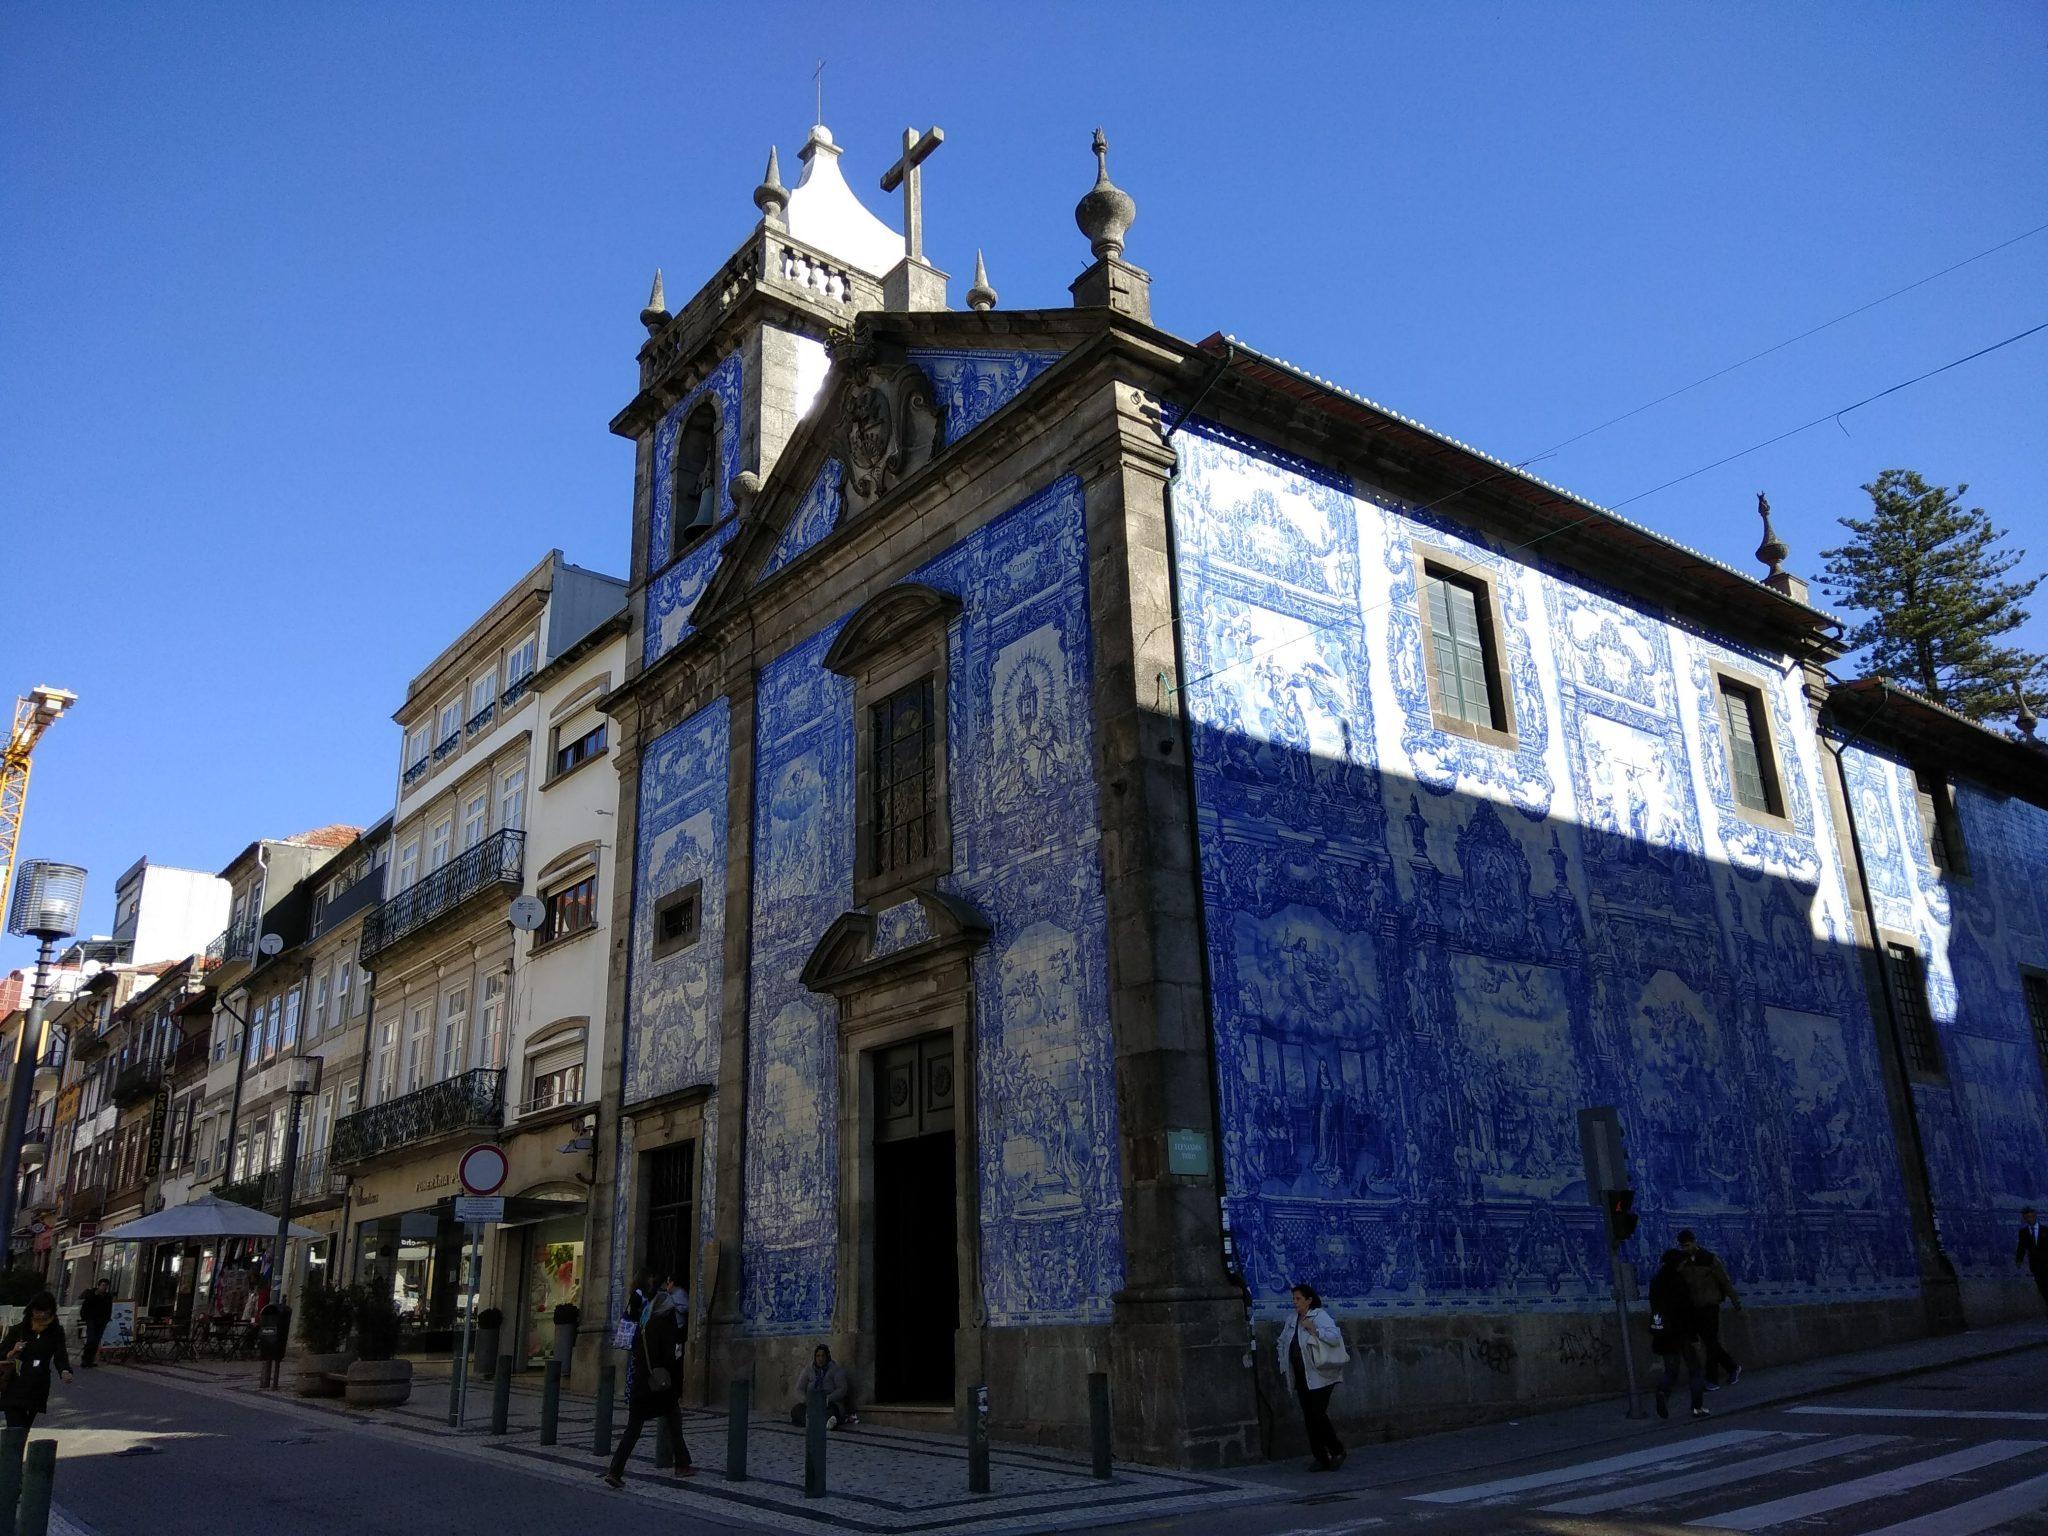 Imagen Post 2 días en Oporto. Iglesia Das Almas - Pasaporte y Millas